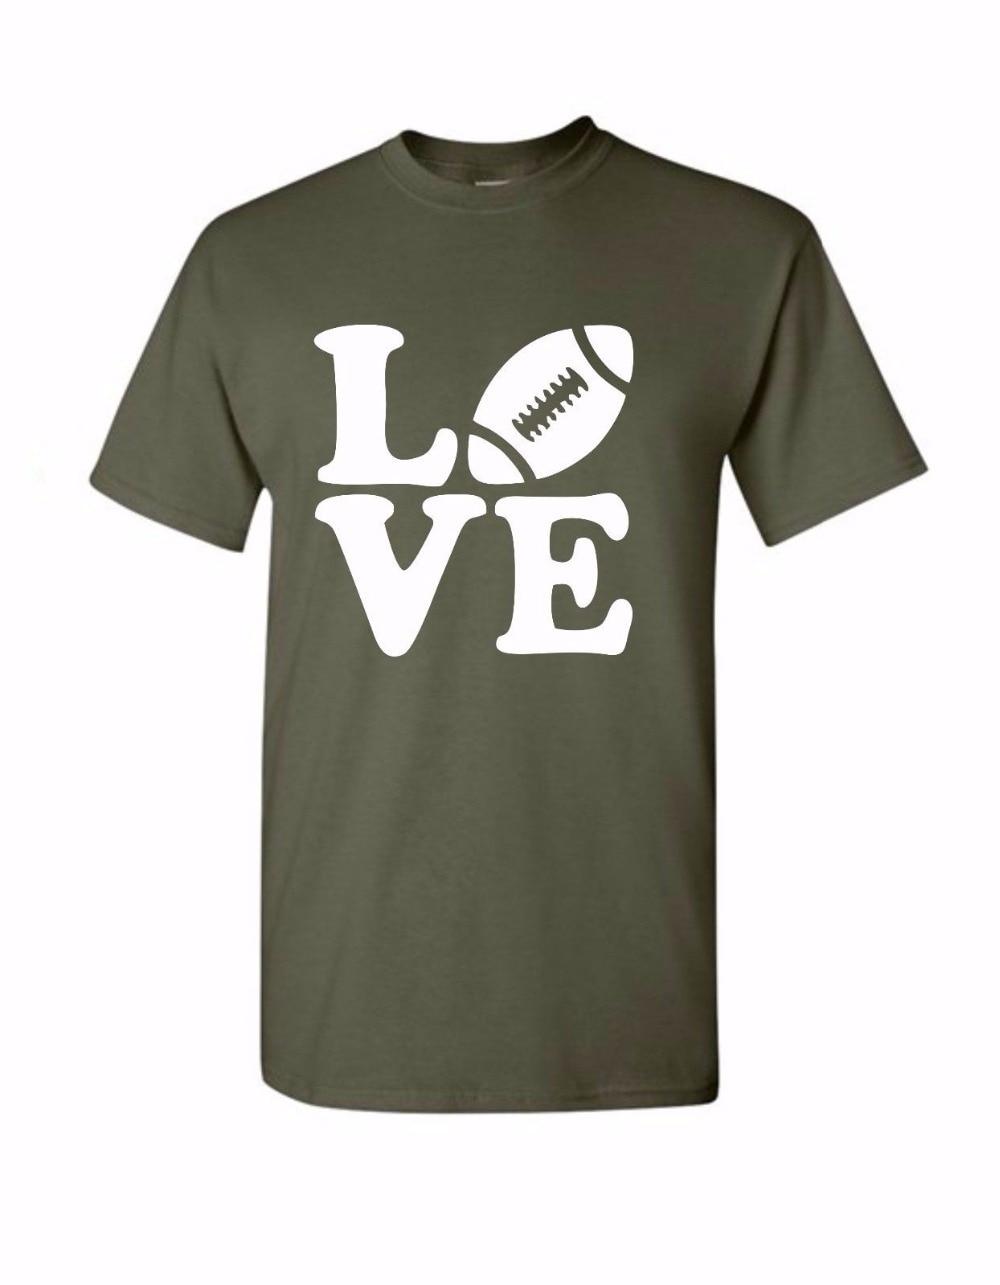 T shirt design youth - 2017 Fashion Short Sleeve T Shirt Youth Round Collar Customized T Shirts Design I Love